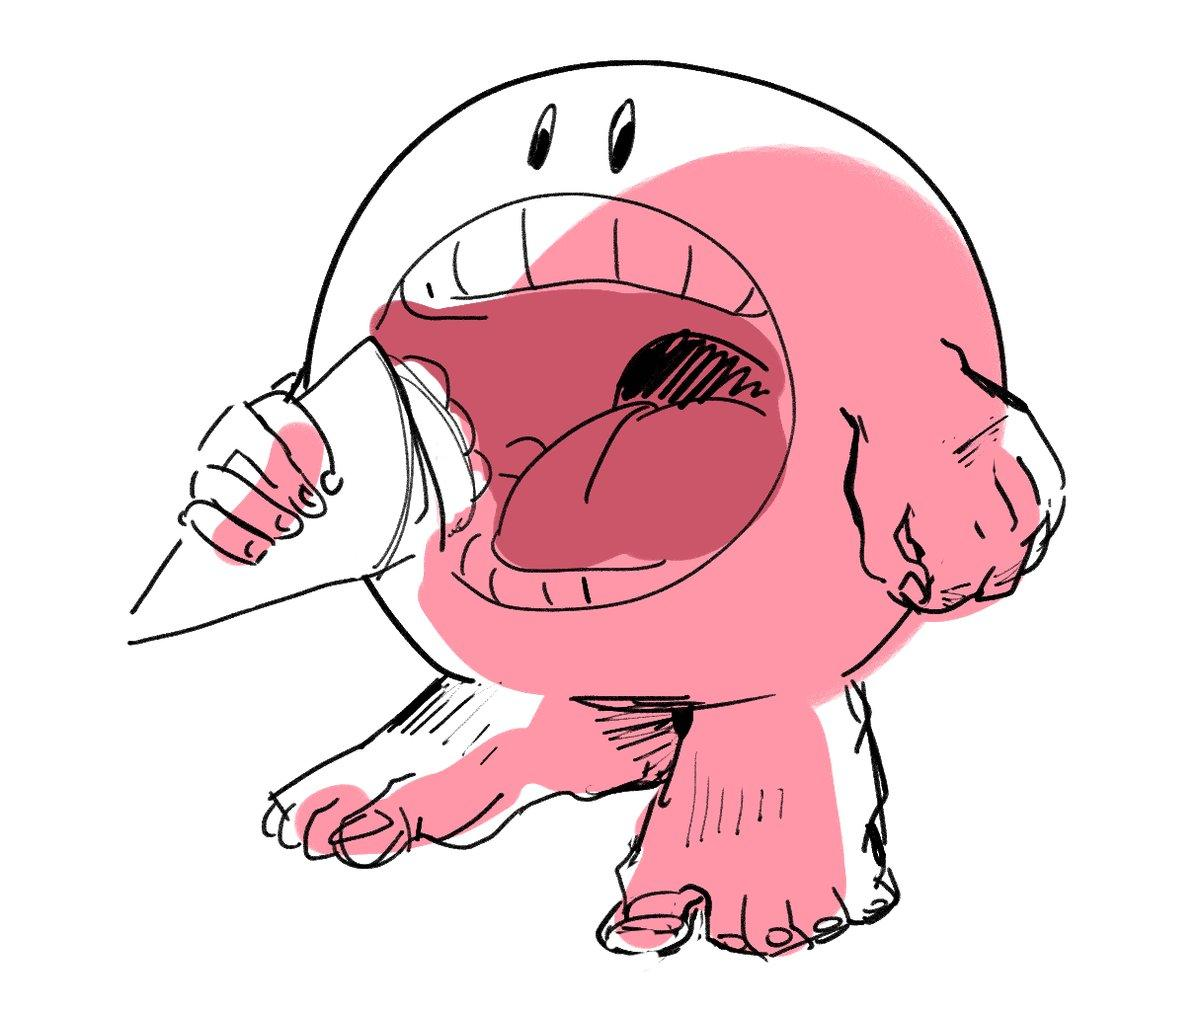 Hamtaro Cute Wallpaper Kirby Fanart 3 Kirby S Human Feet Know Your Meme